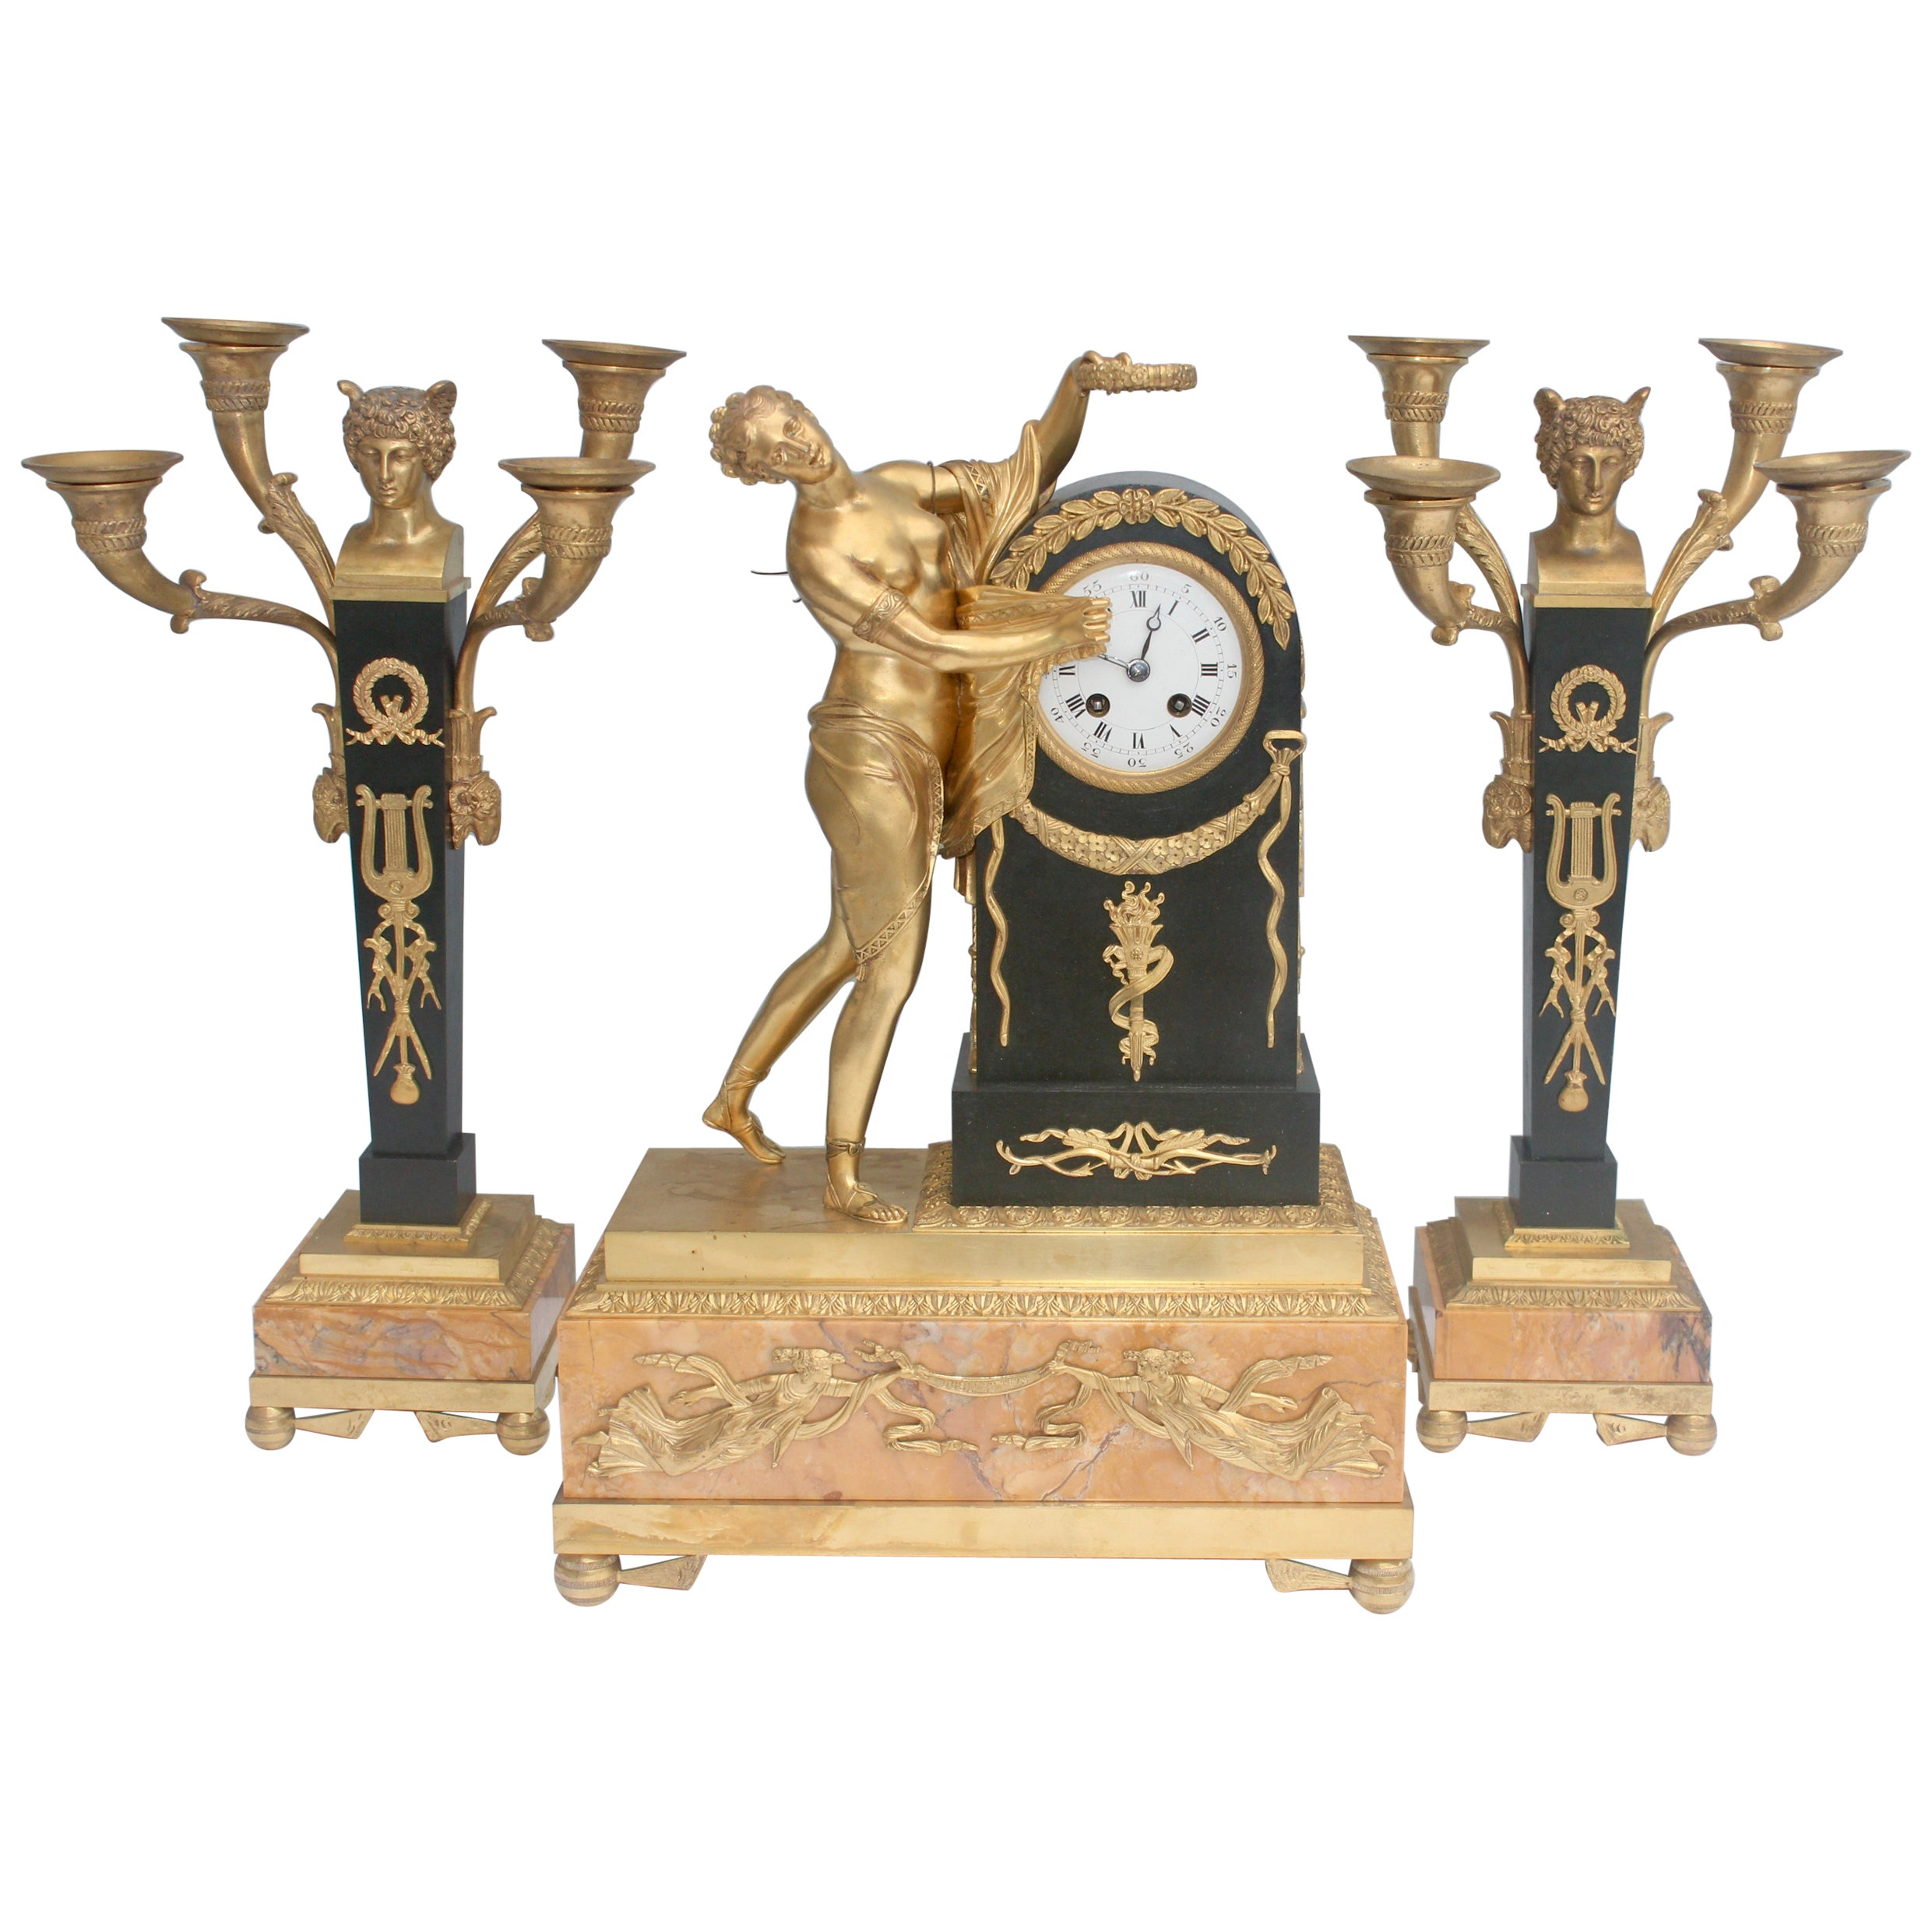 19th French Empire Ormolu and Patinated Bronze Three-Piece Clock Garniture